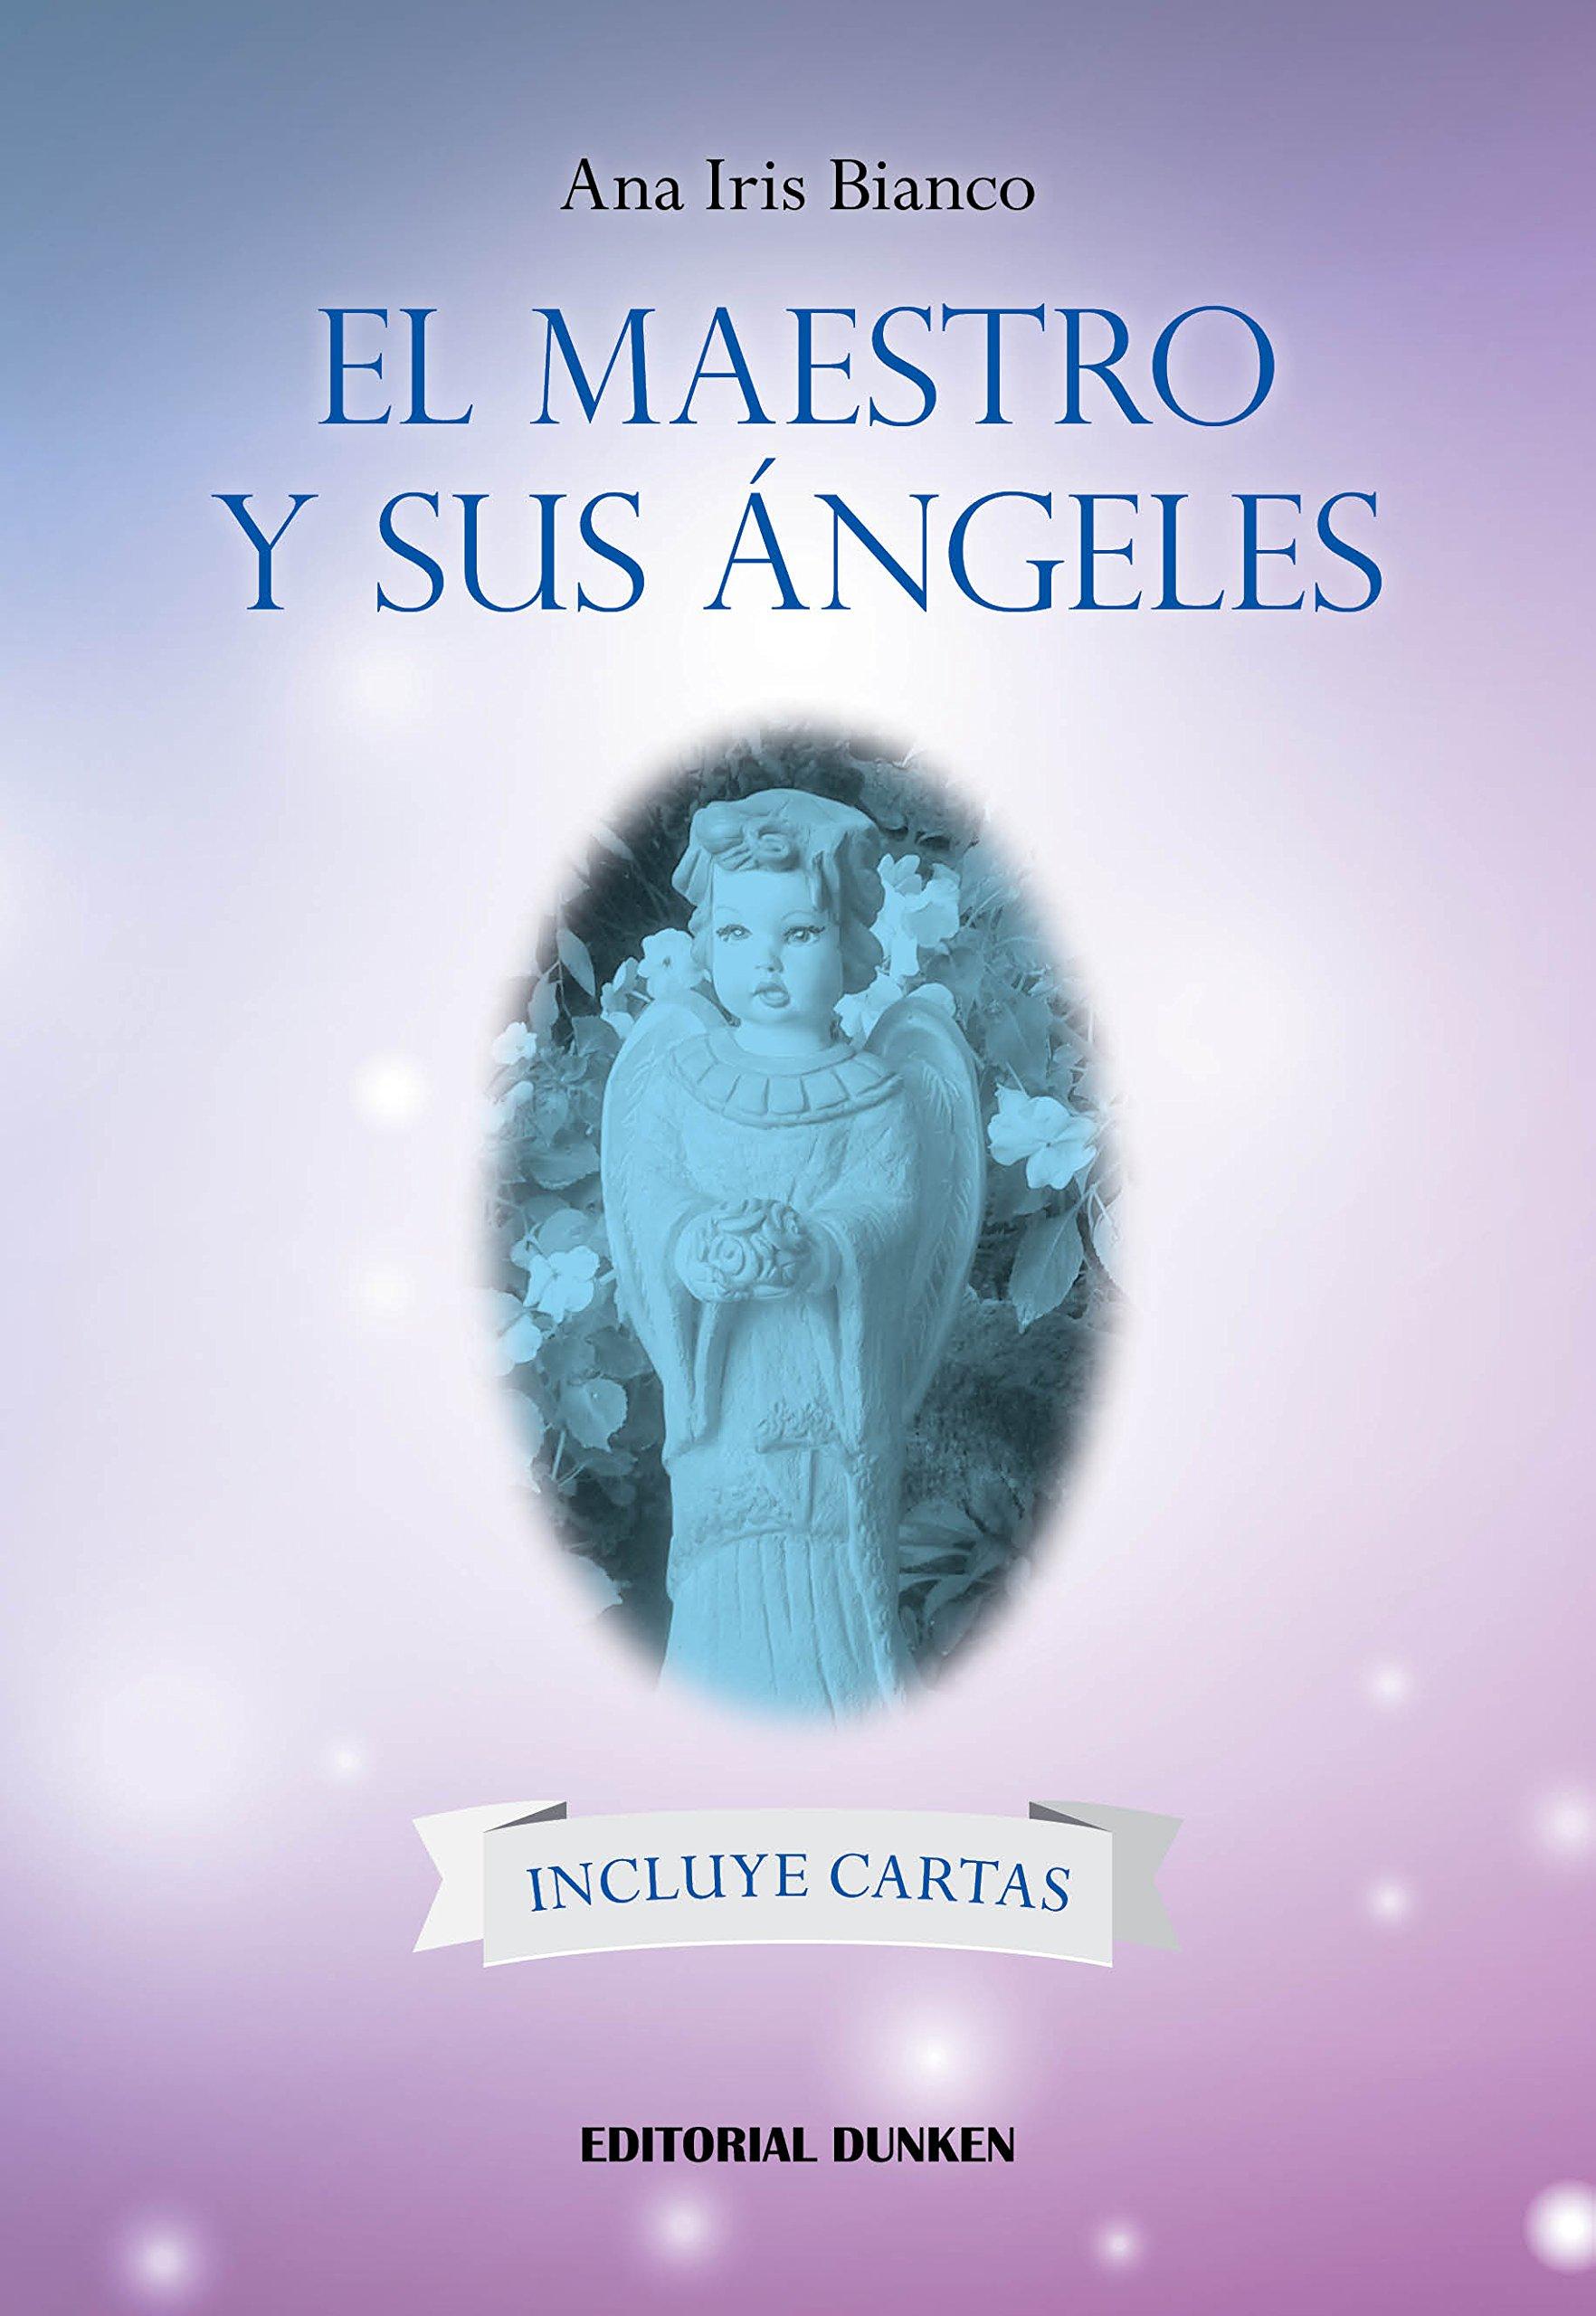 El Maestro y sus Ángeles: Bianco Ana Iris: 9789870299530 ...